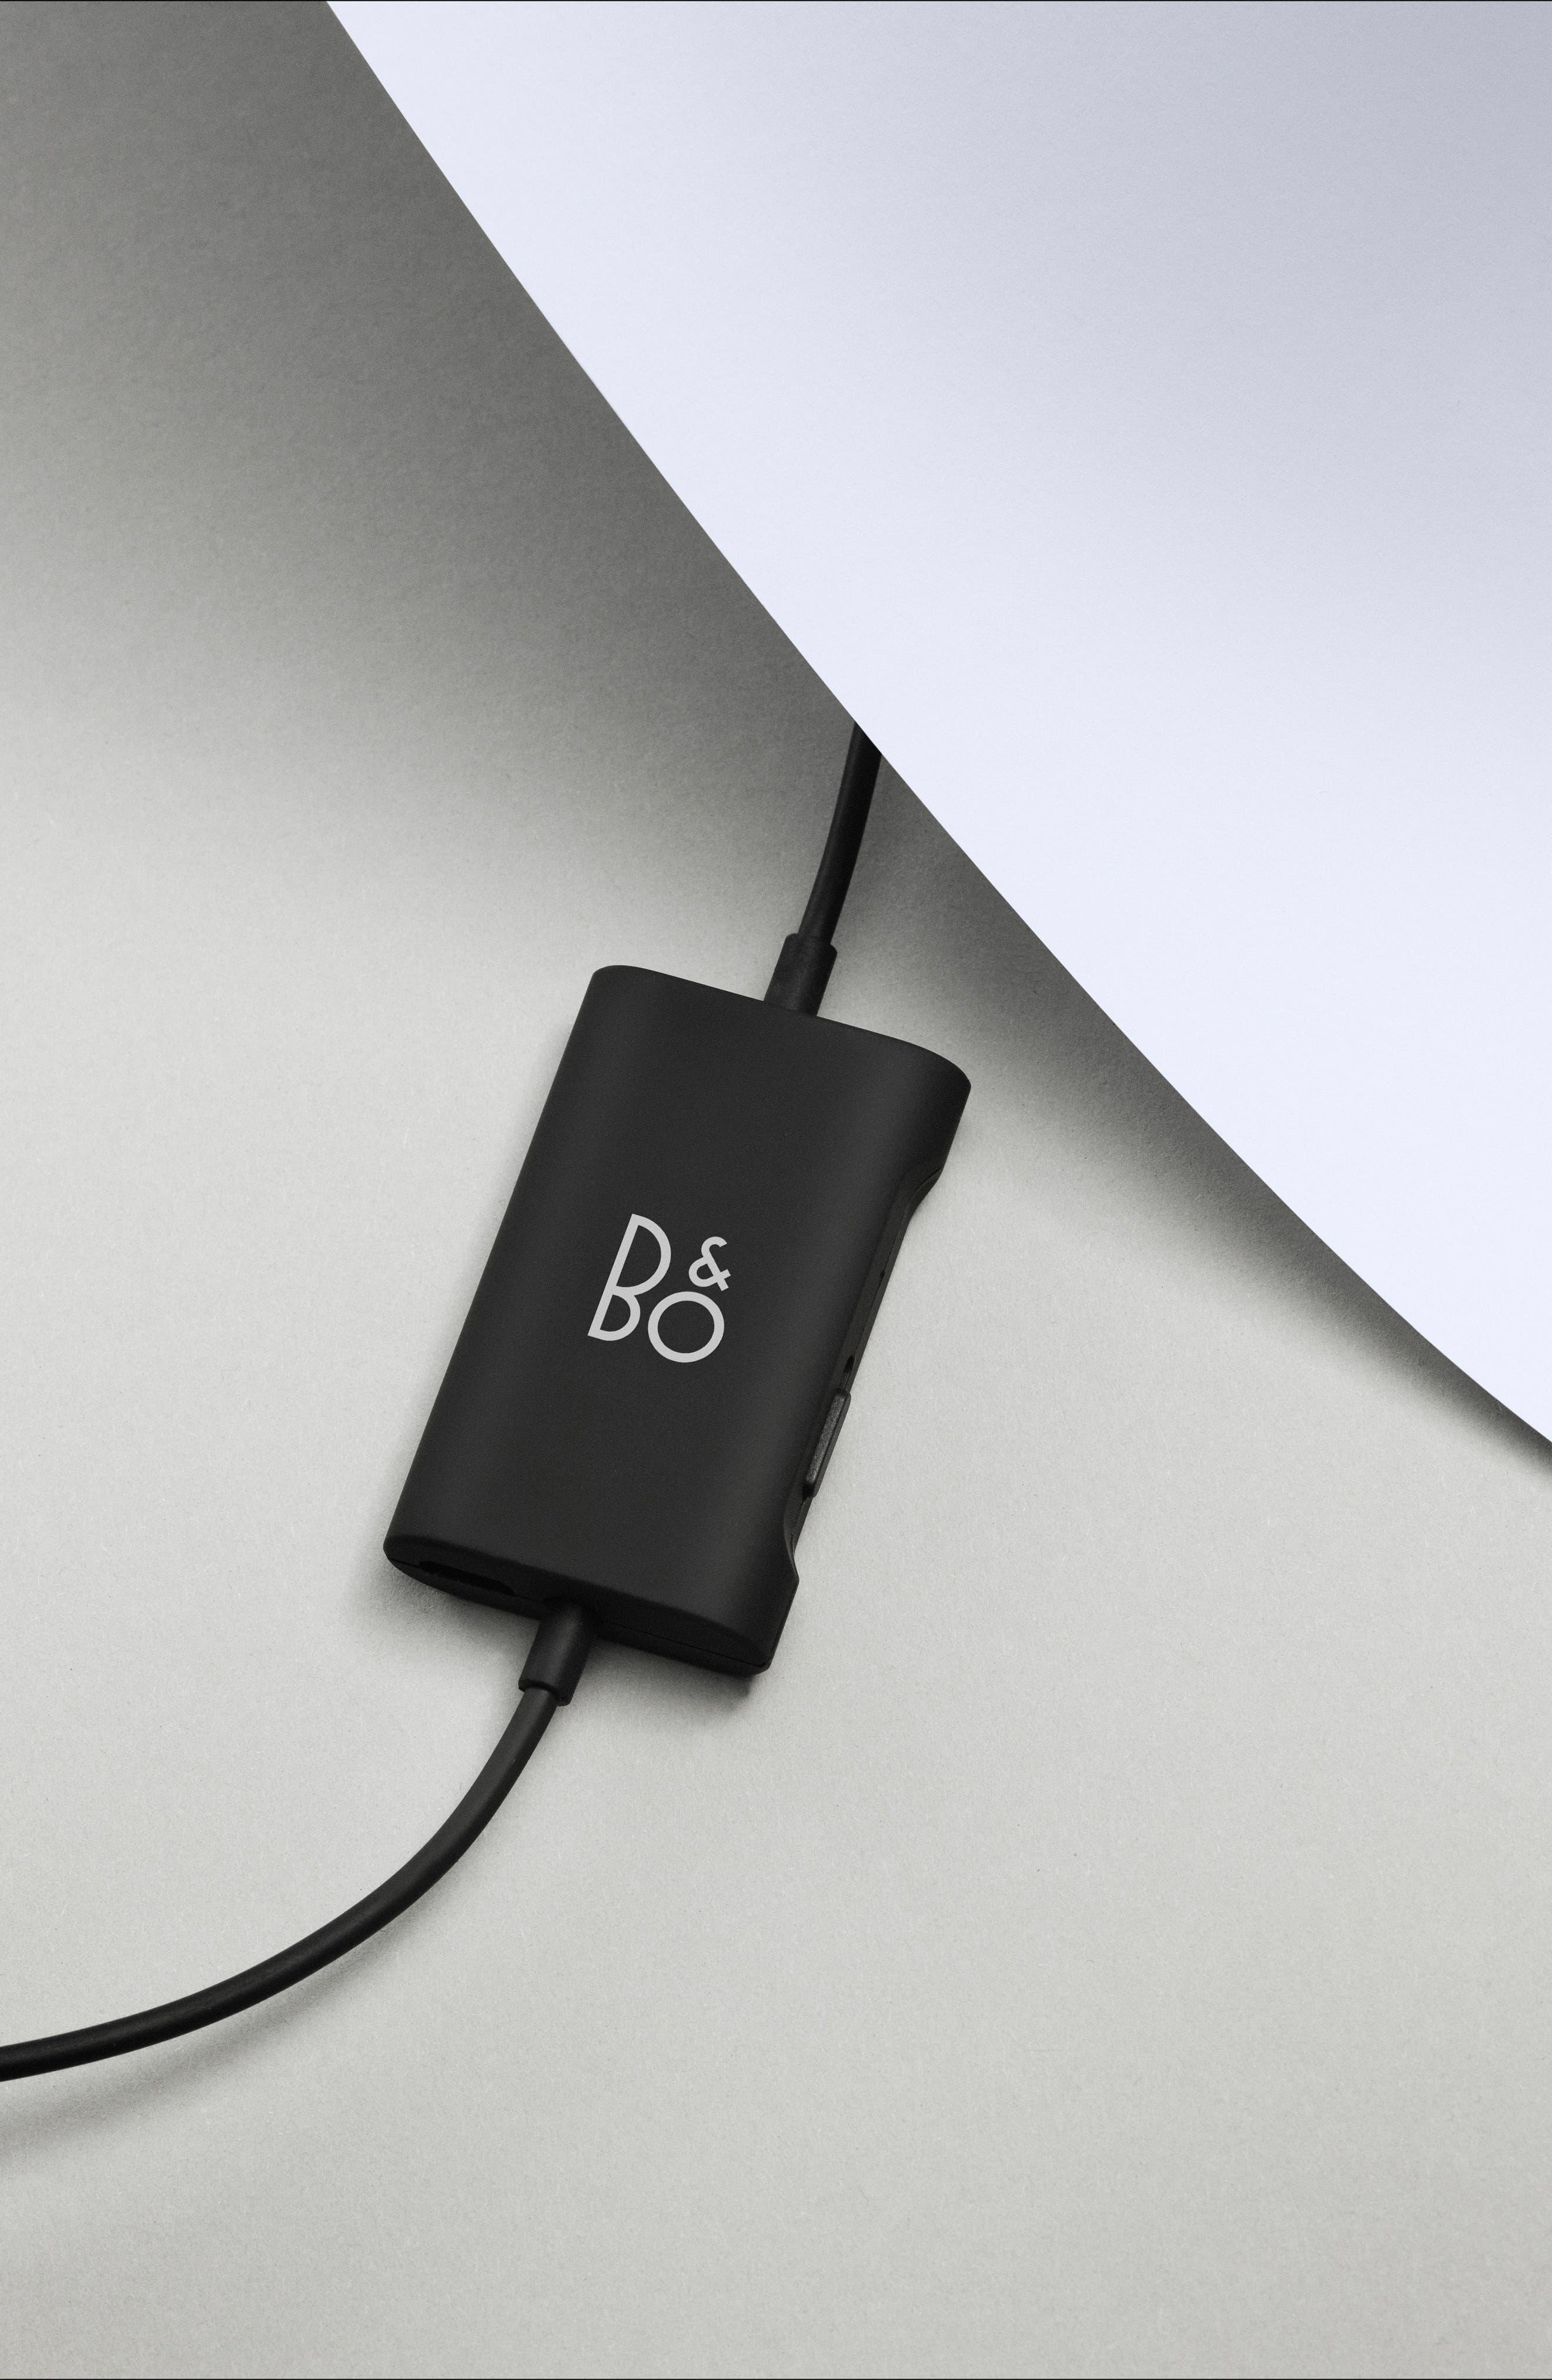 B&O PLAY E4 Noise Canceling In-Ear Headphones,                             Alternate thumbnail 6, color,                             BLACK